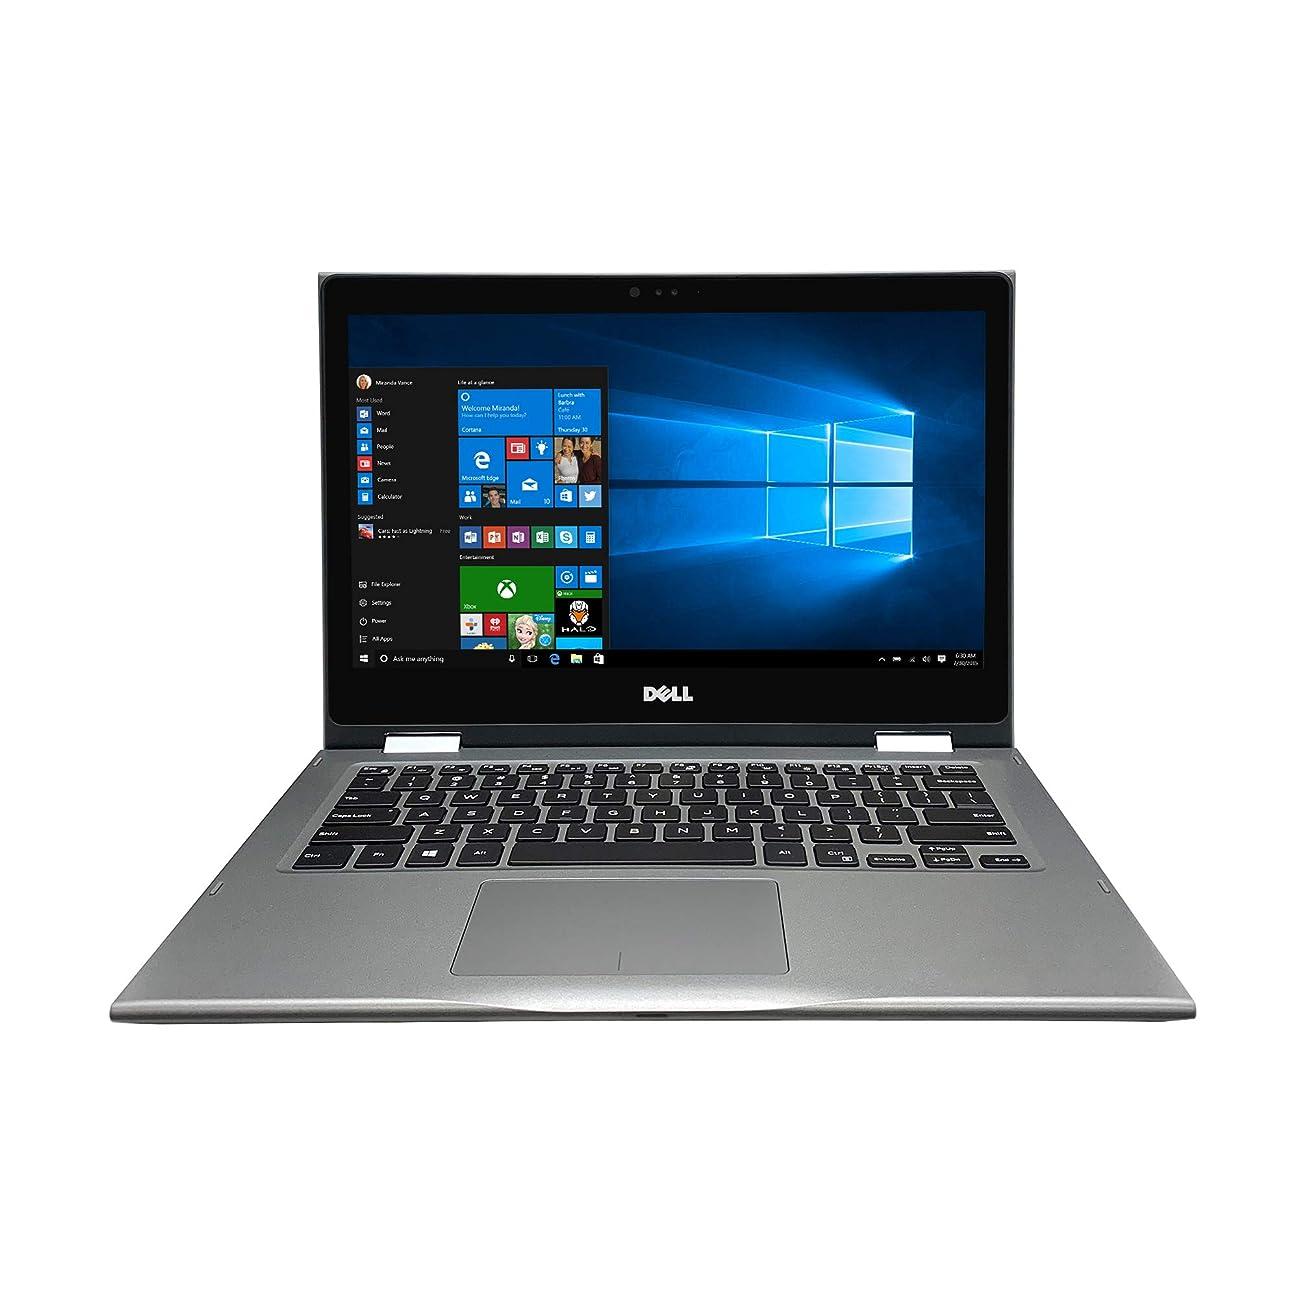 Dell Inspiron 13 5000 Series 5379 13.3